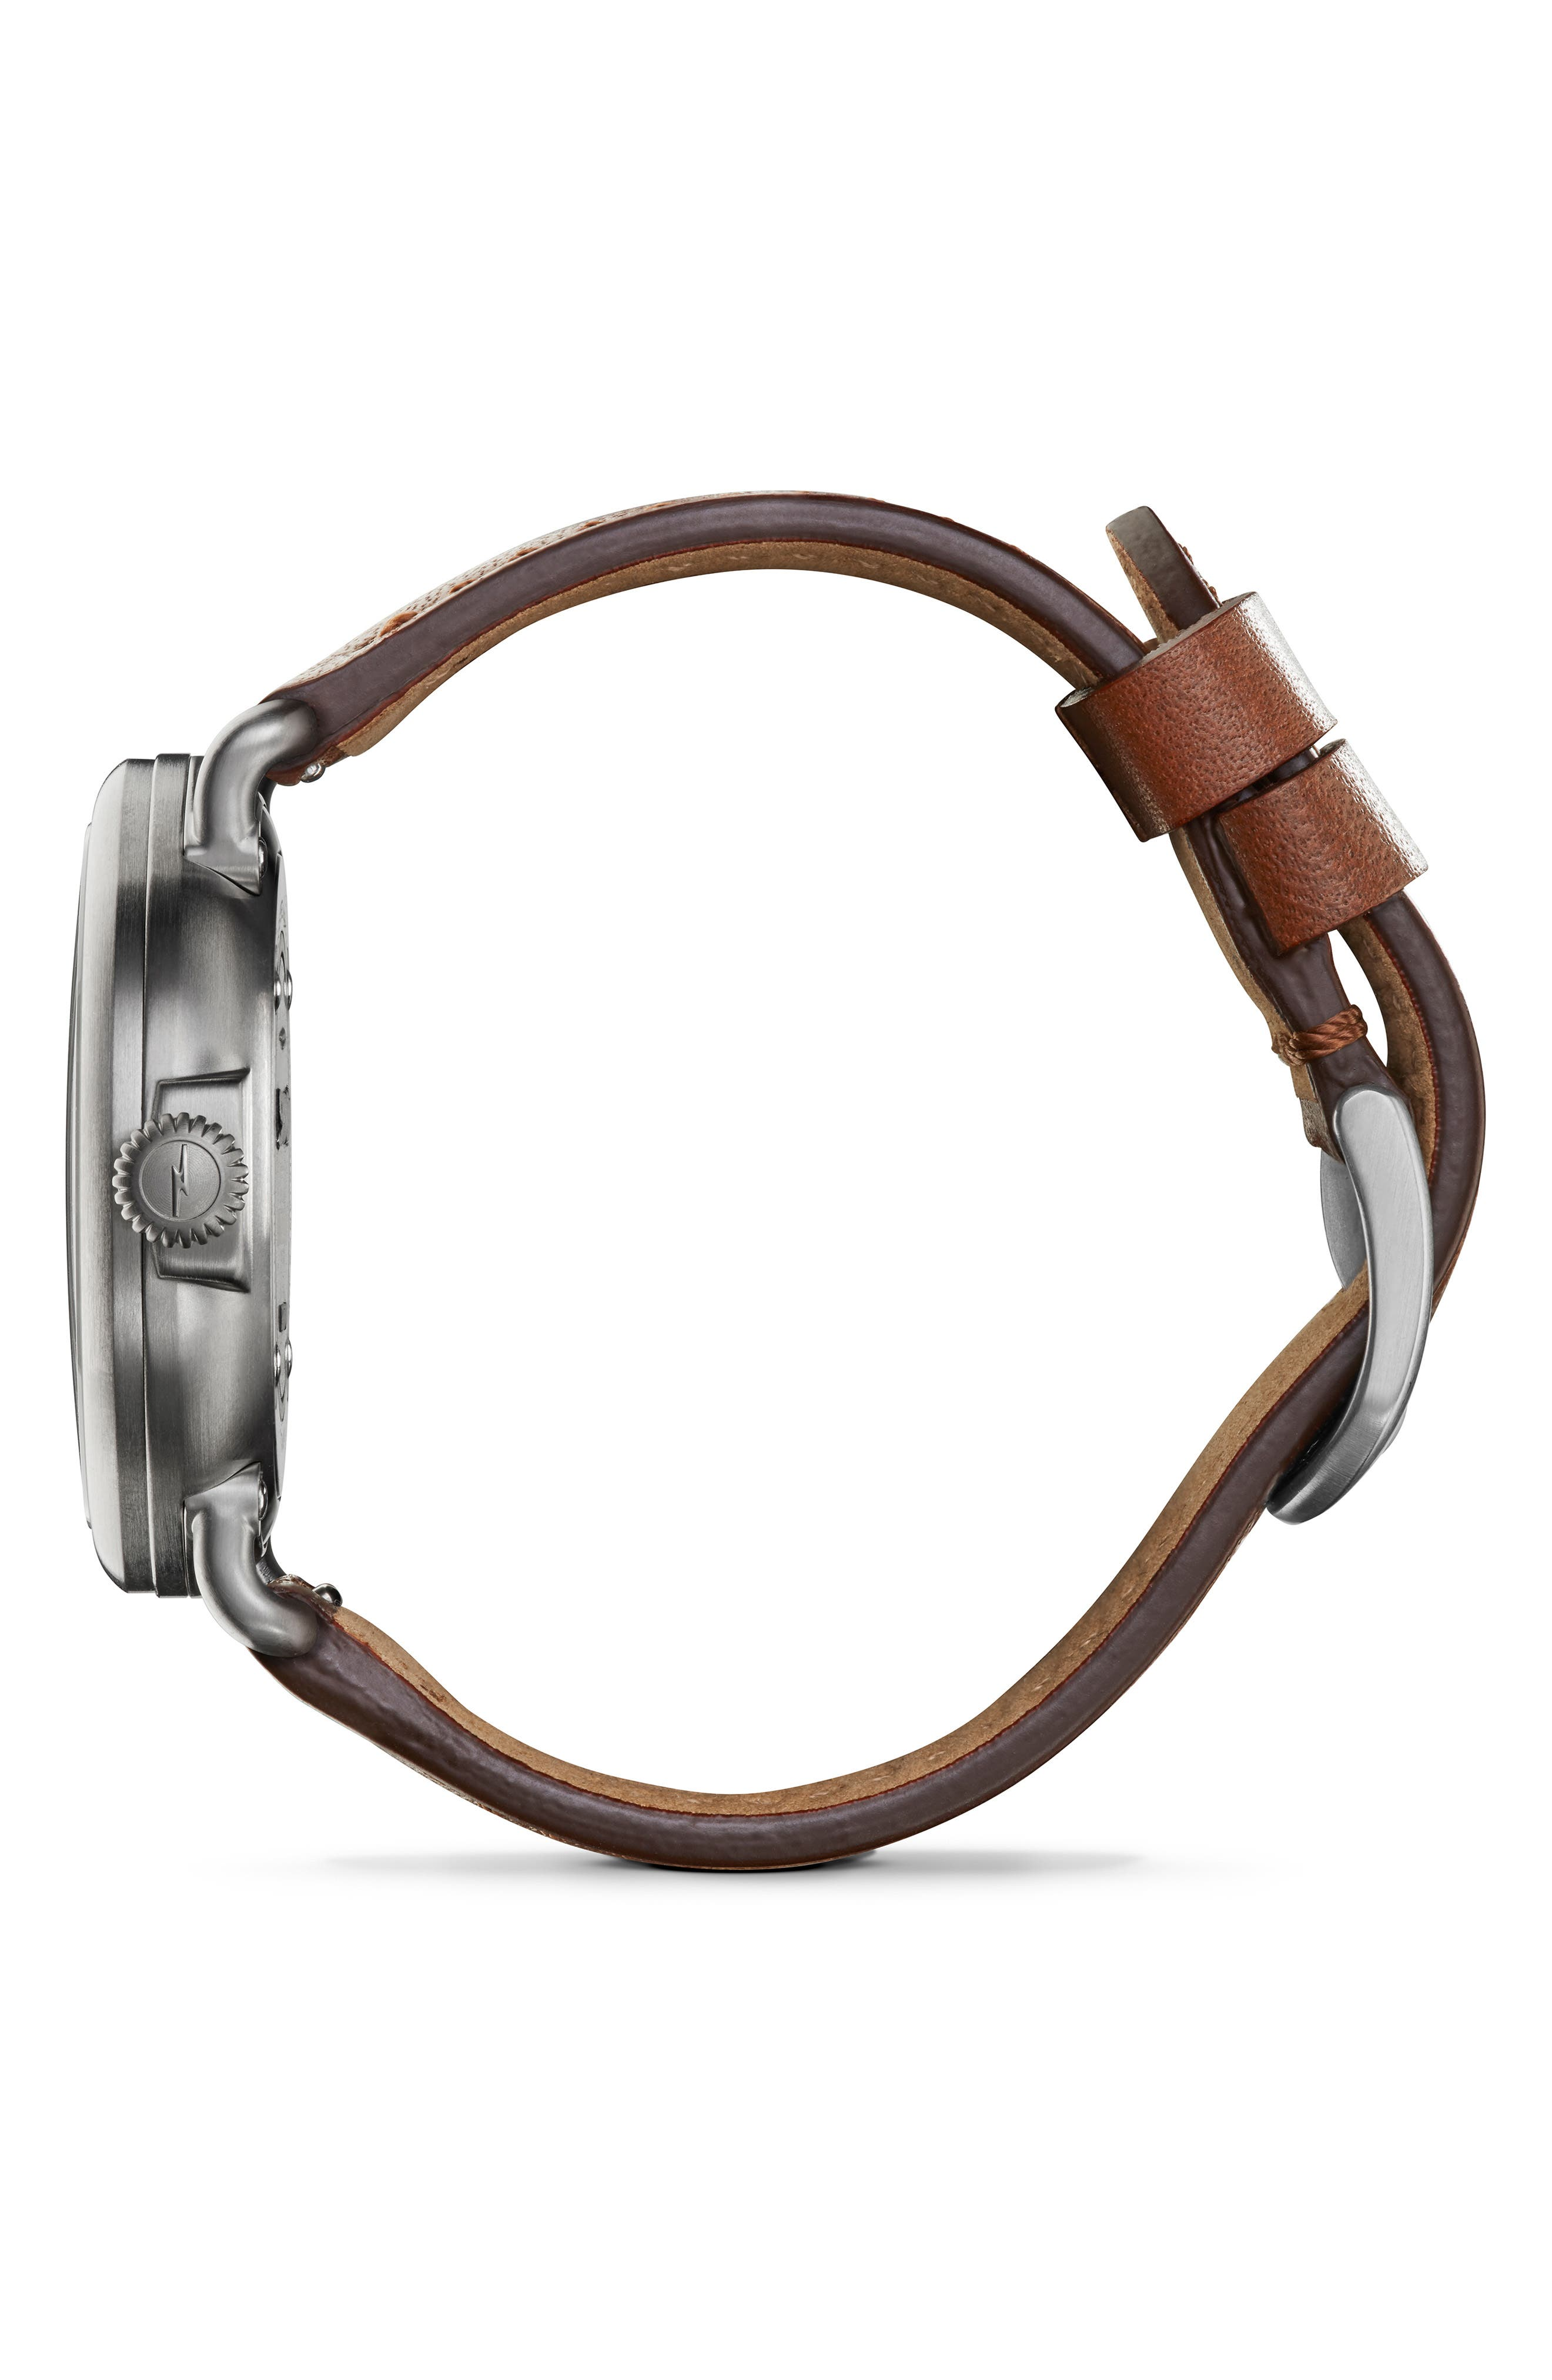 SHINOLA, 'The Runwell' Leather Strap Watch, 41mm, Alternate thumbnail 3, color, DARK COGNAC/ GUNMETAL/ GREY